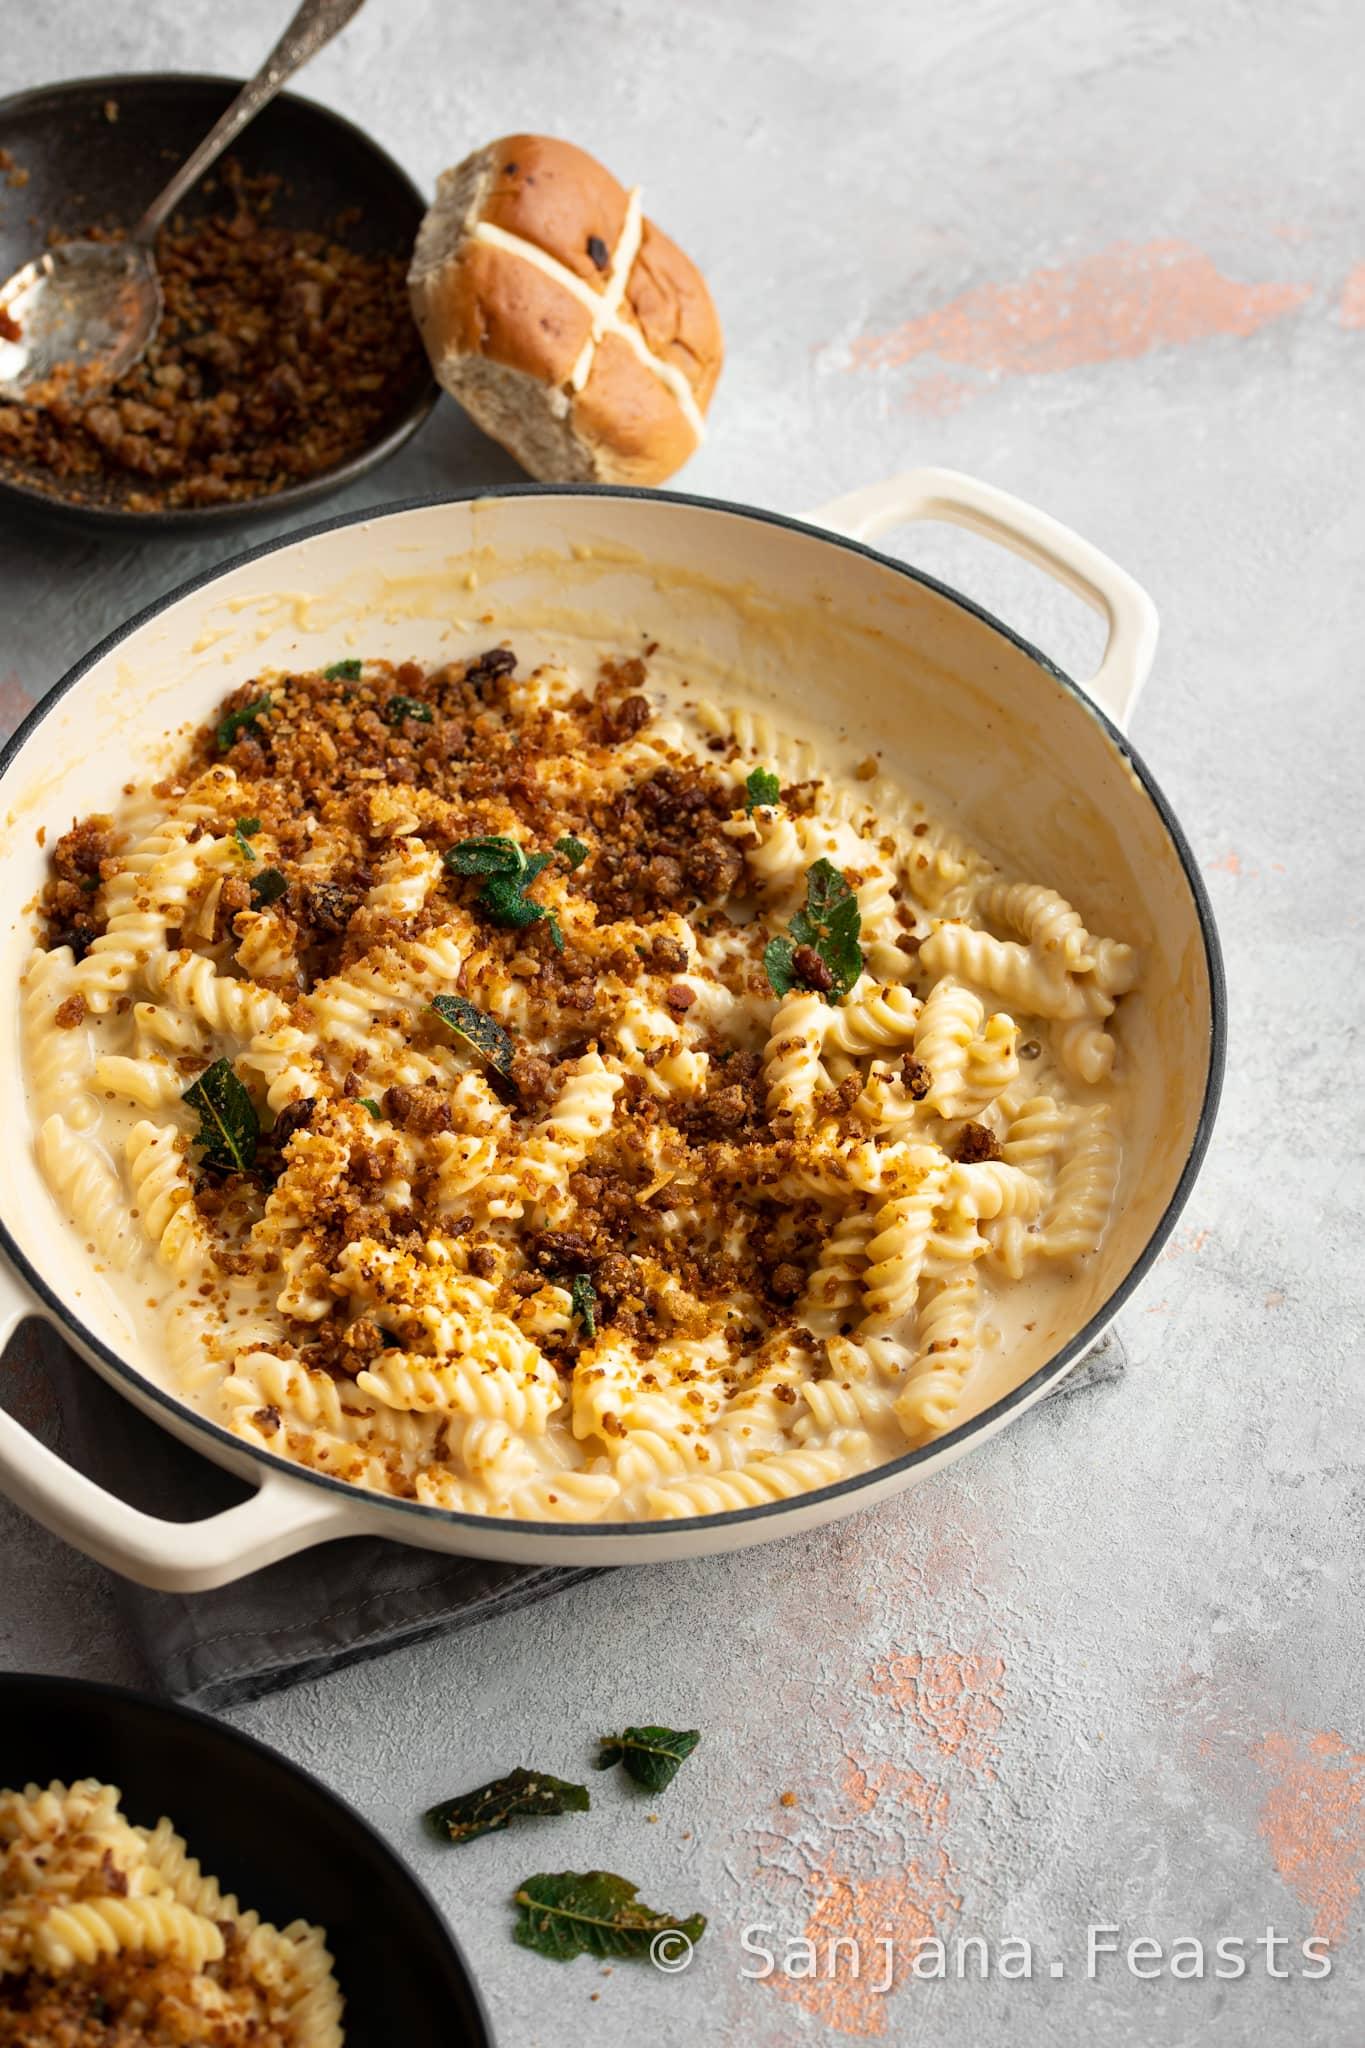 Hot Cross Crumb Mac & Cheese